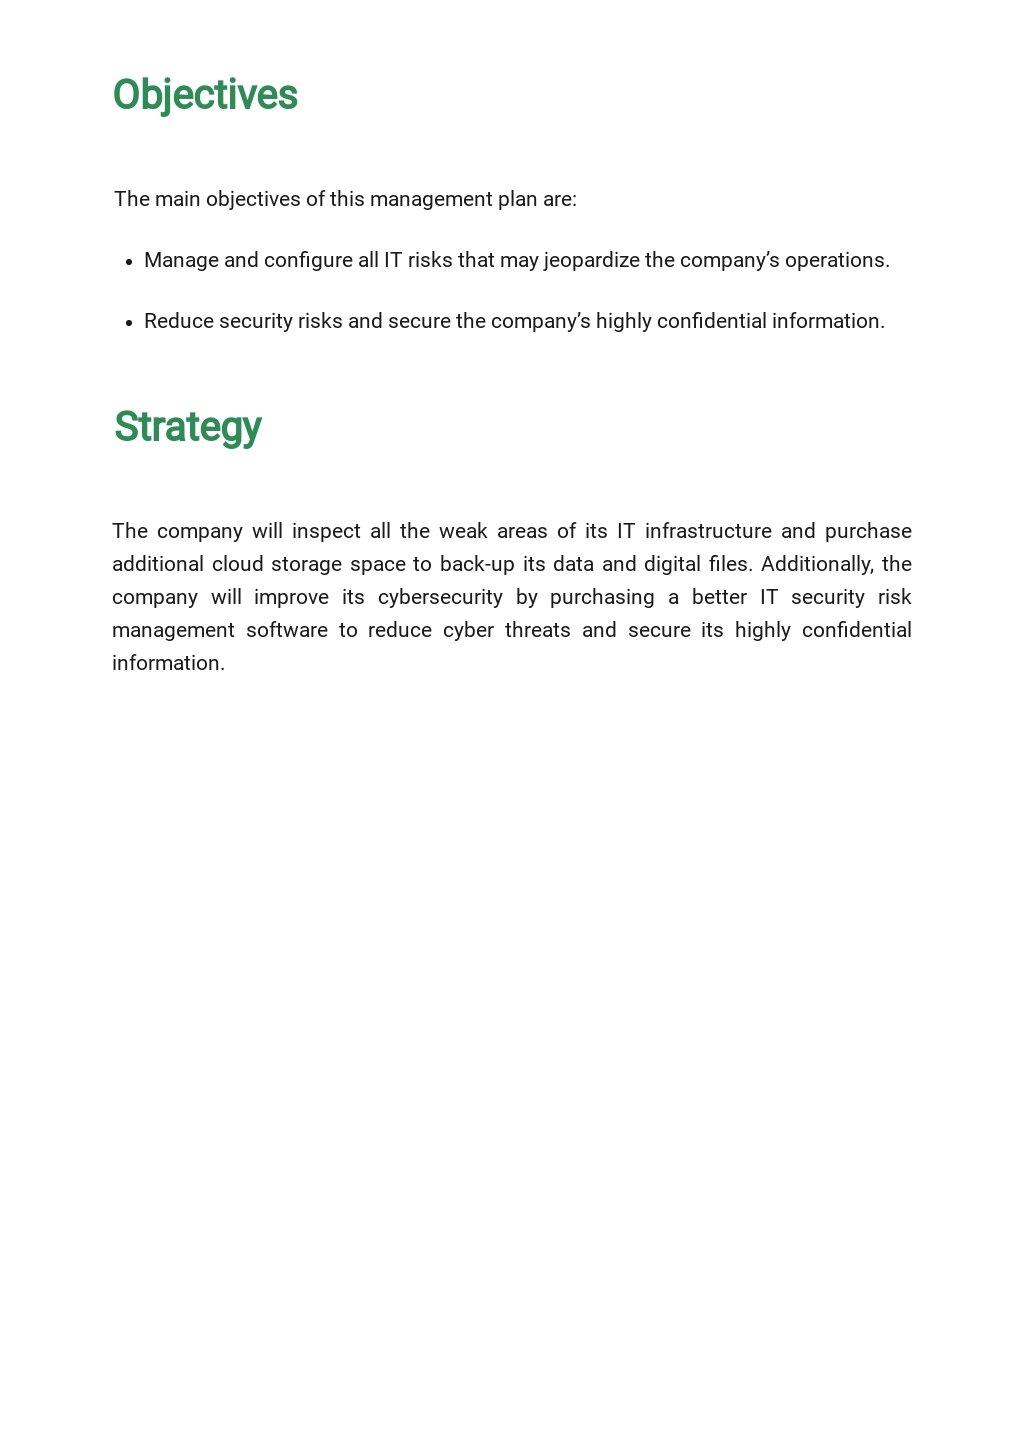 Risk Management Plan Form Template  - Google Docs, Word, Apple Pages